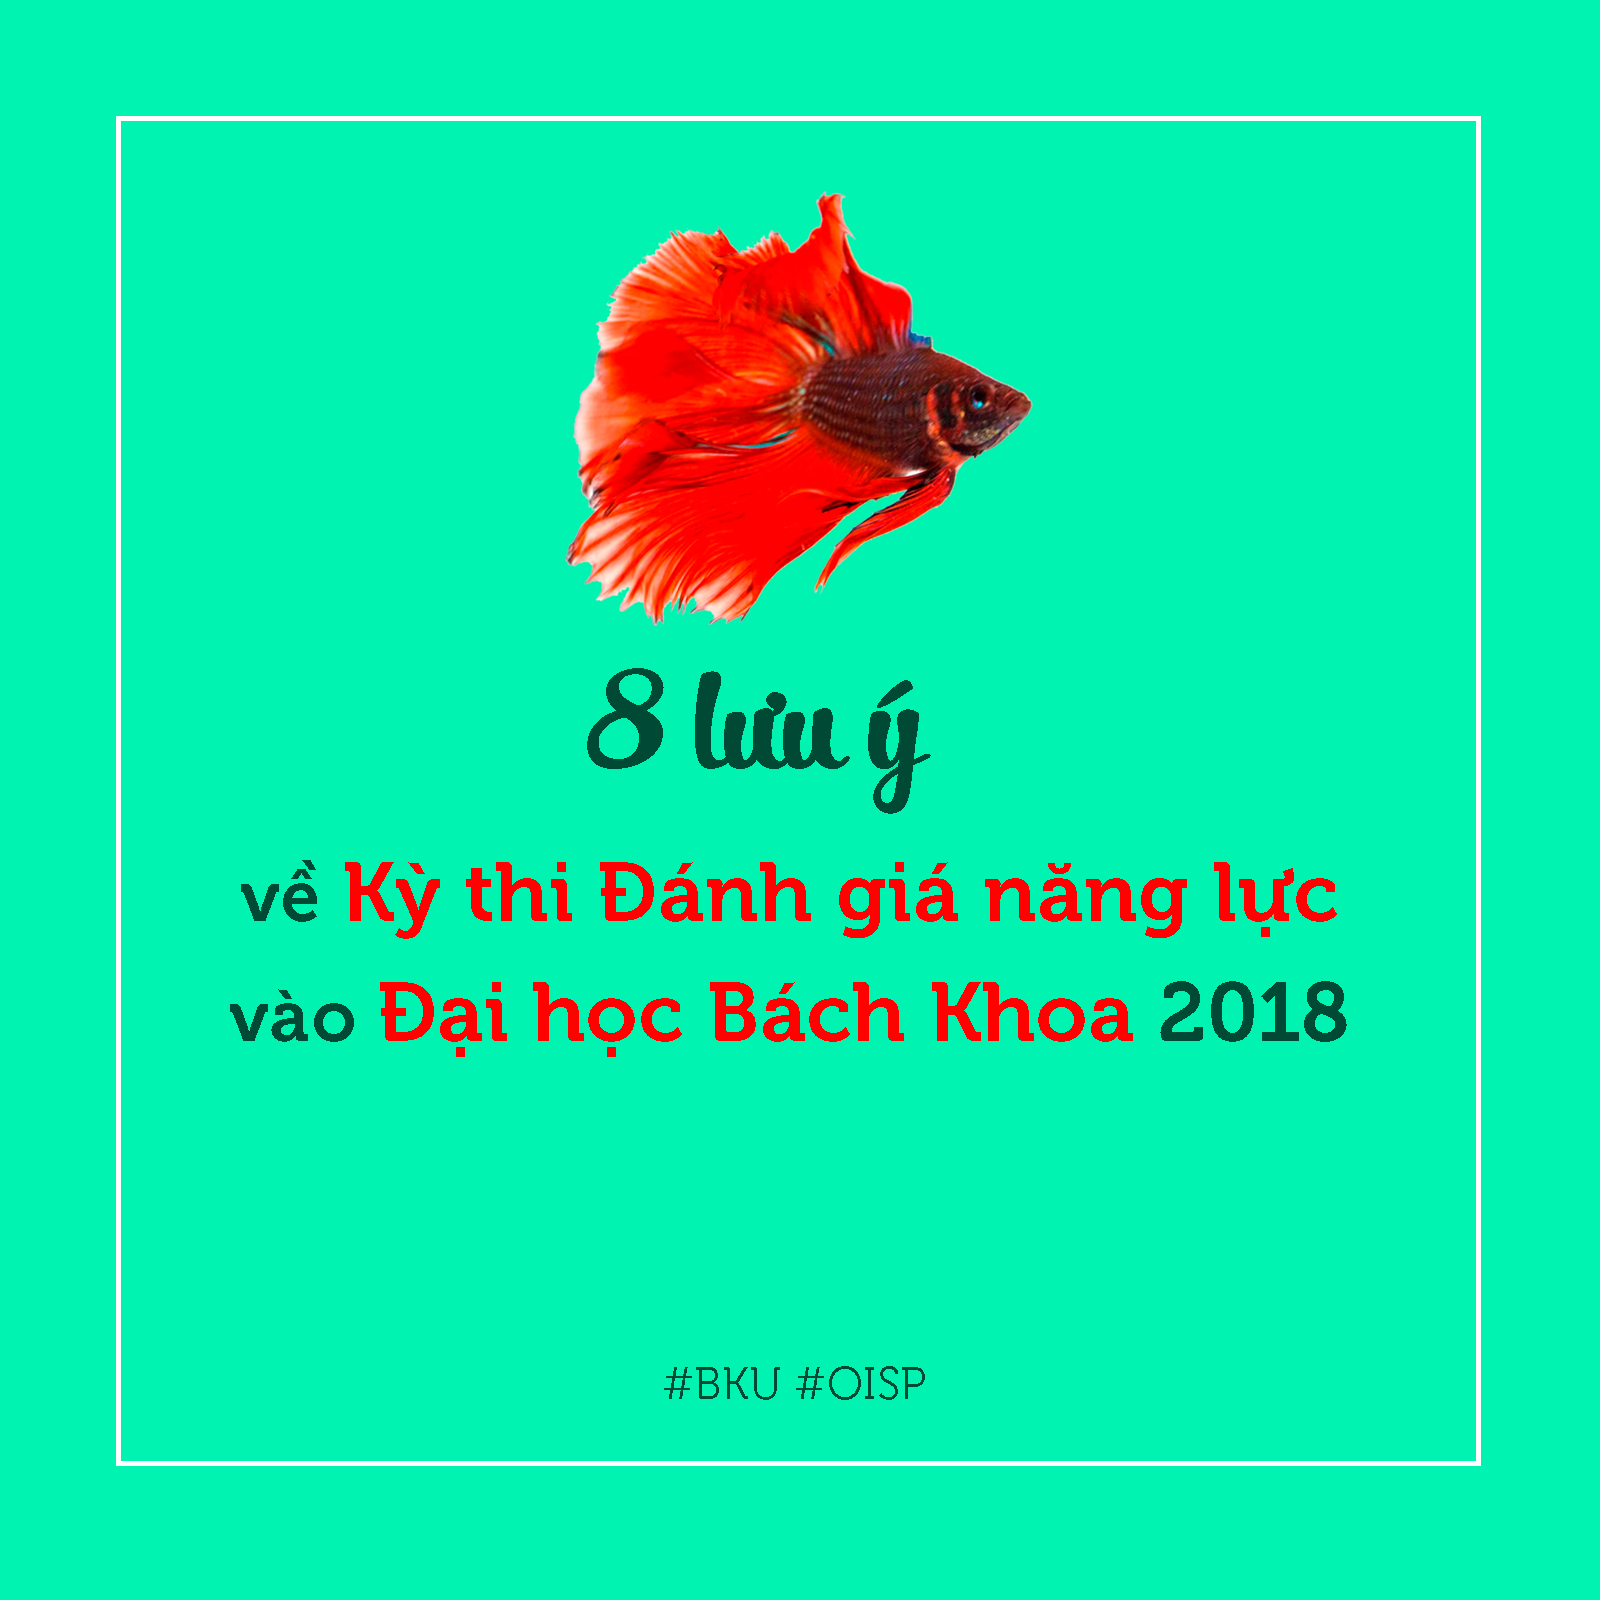 8 luu y ve Ky thi Danh gia nang luc 2018 01